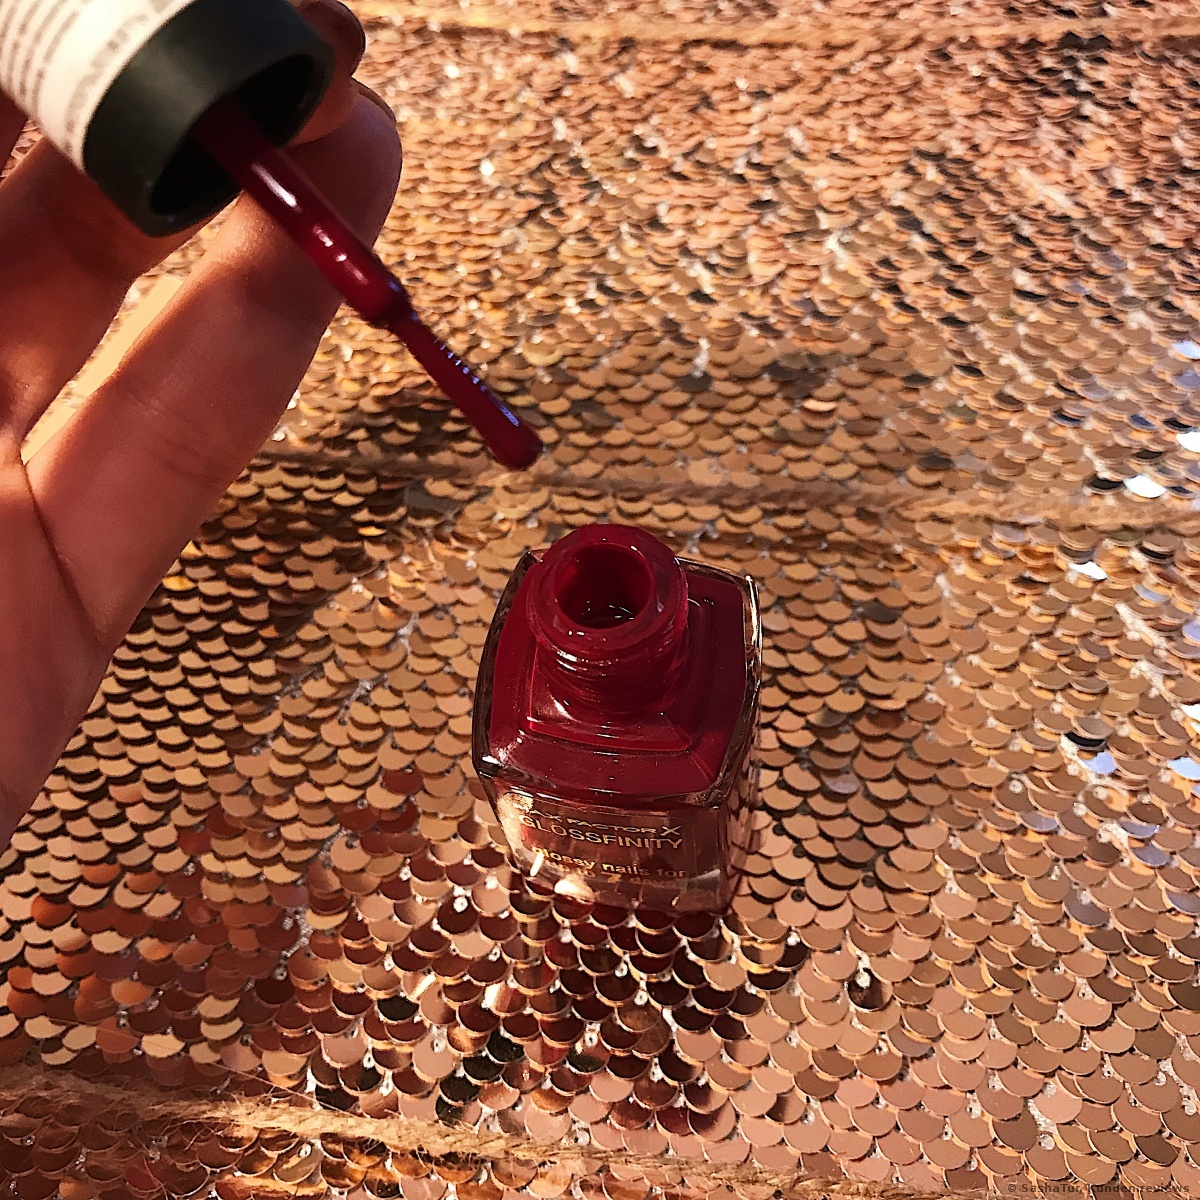 Glossfinity Nagellack von Max Factor - 155 burgundy crash